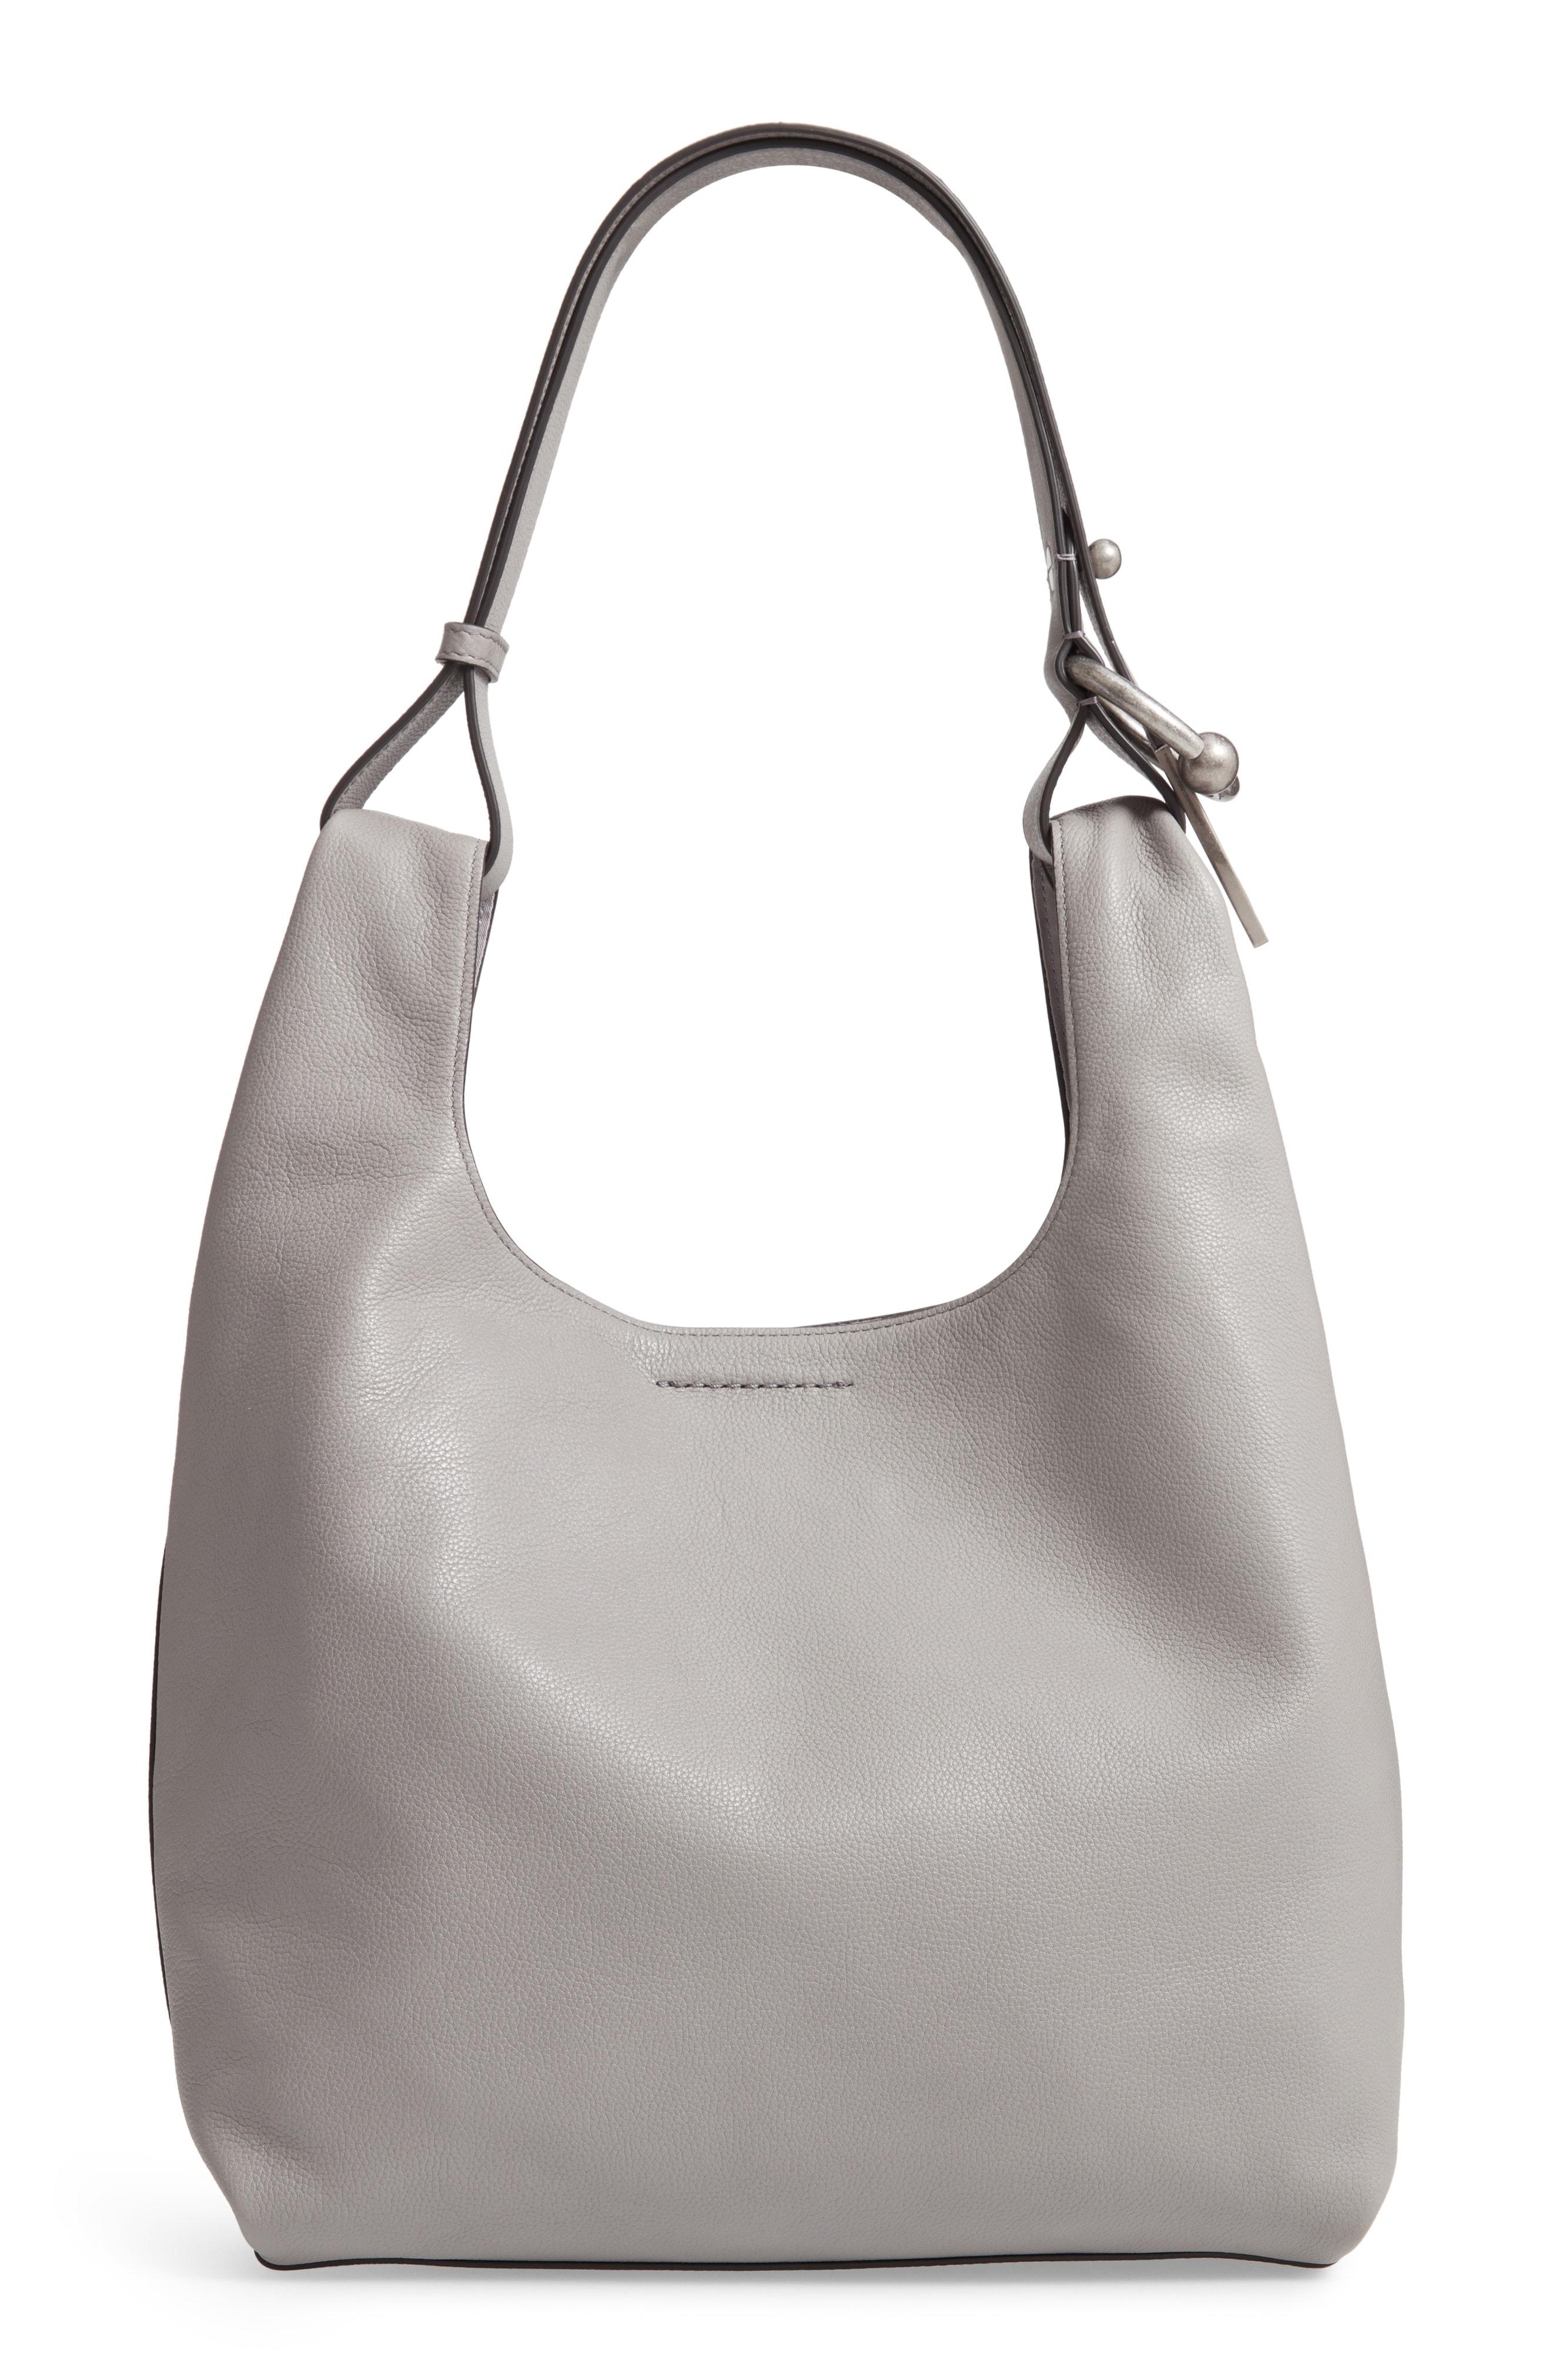 6c01ca427f9 Lyst - Rebecca Minkoff Karlie Medium Leather Hobo in Gray